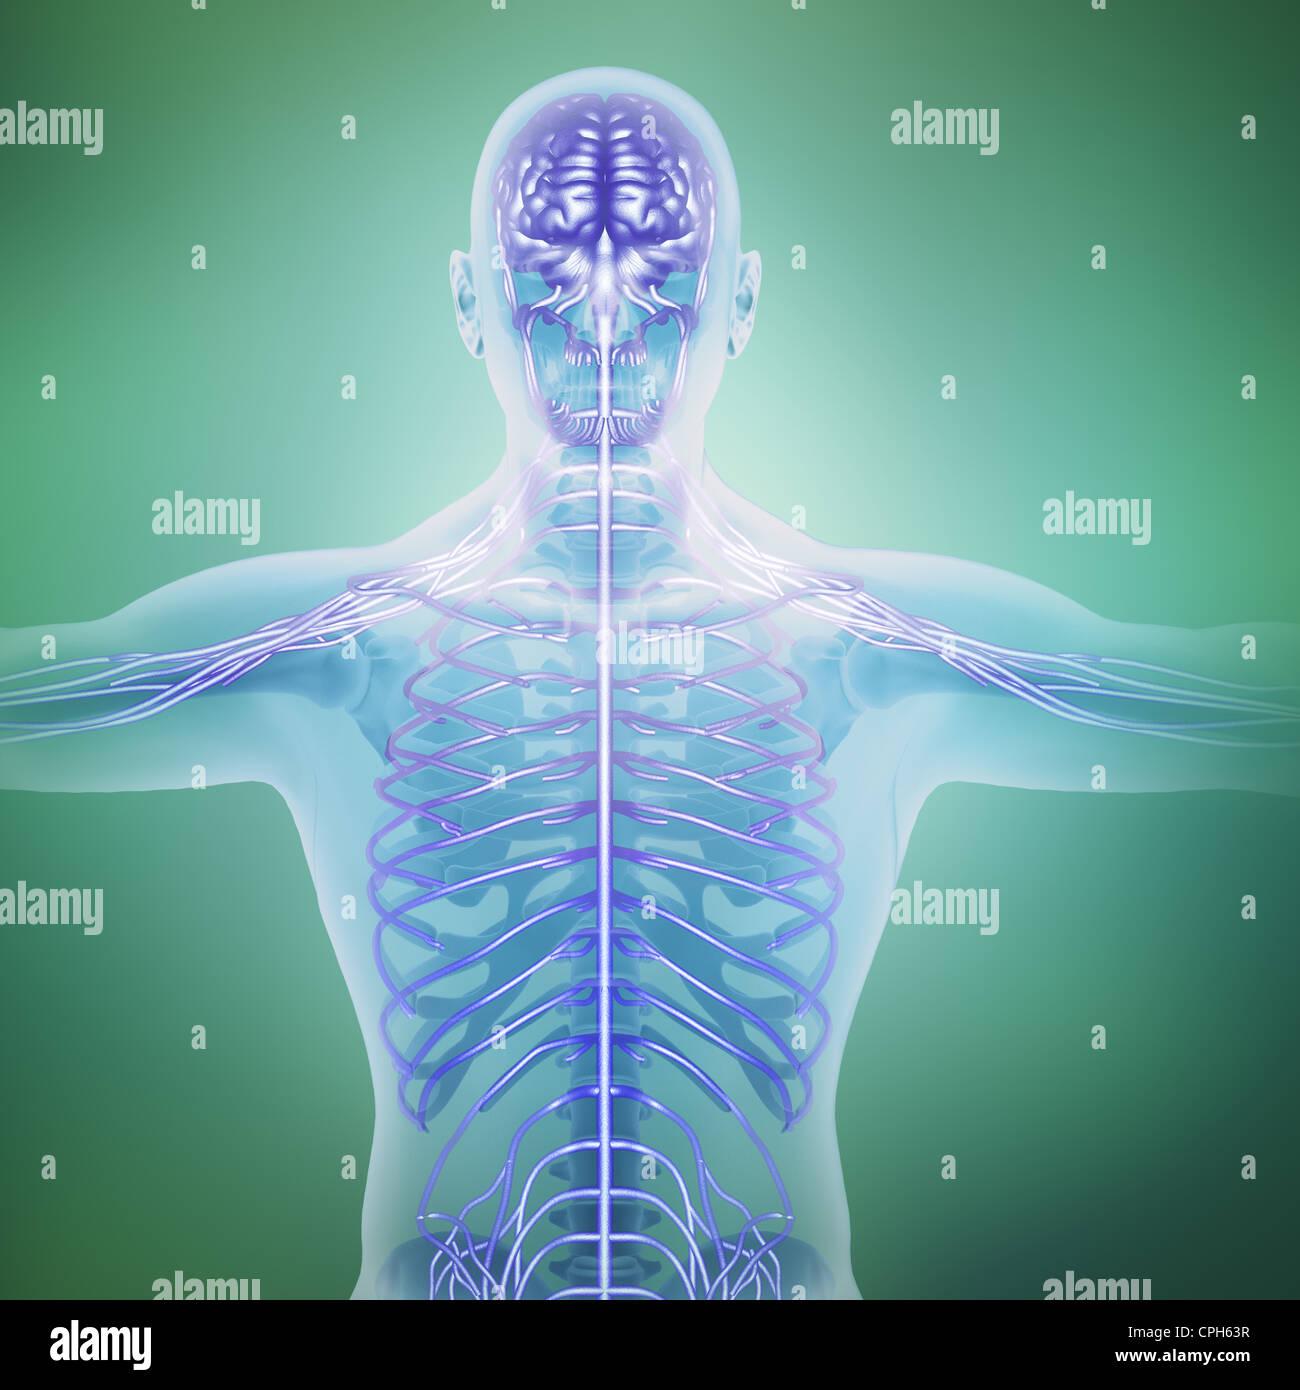 Menschliche Anatomie-Illustration - Zentralnervensystem Stockfoto